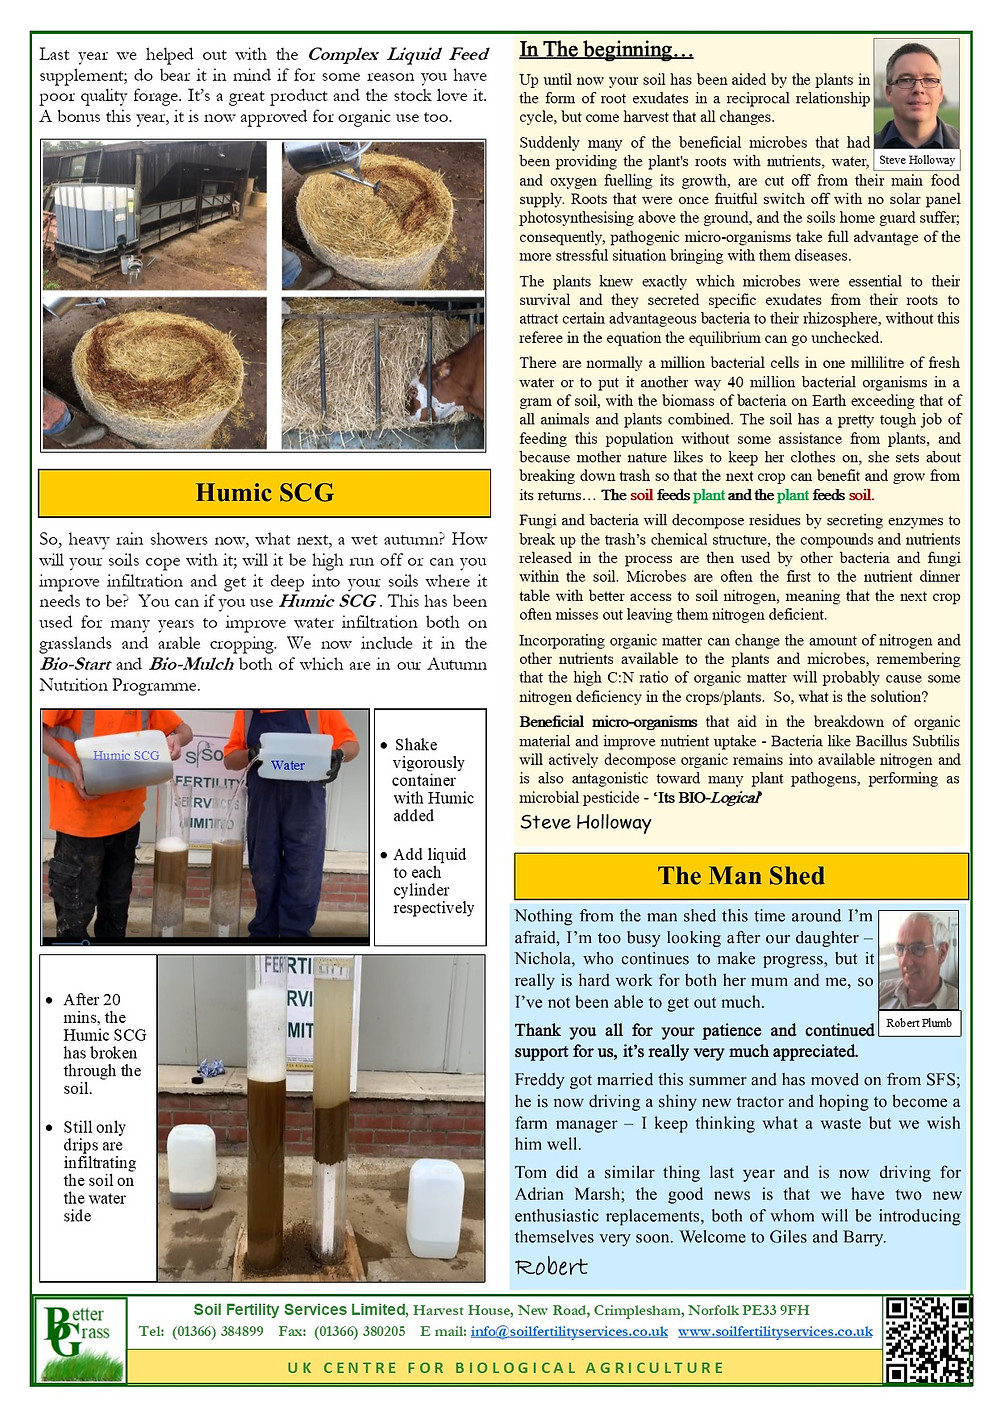 Soil Fertility Services Newsletter